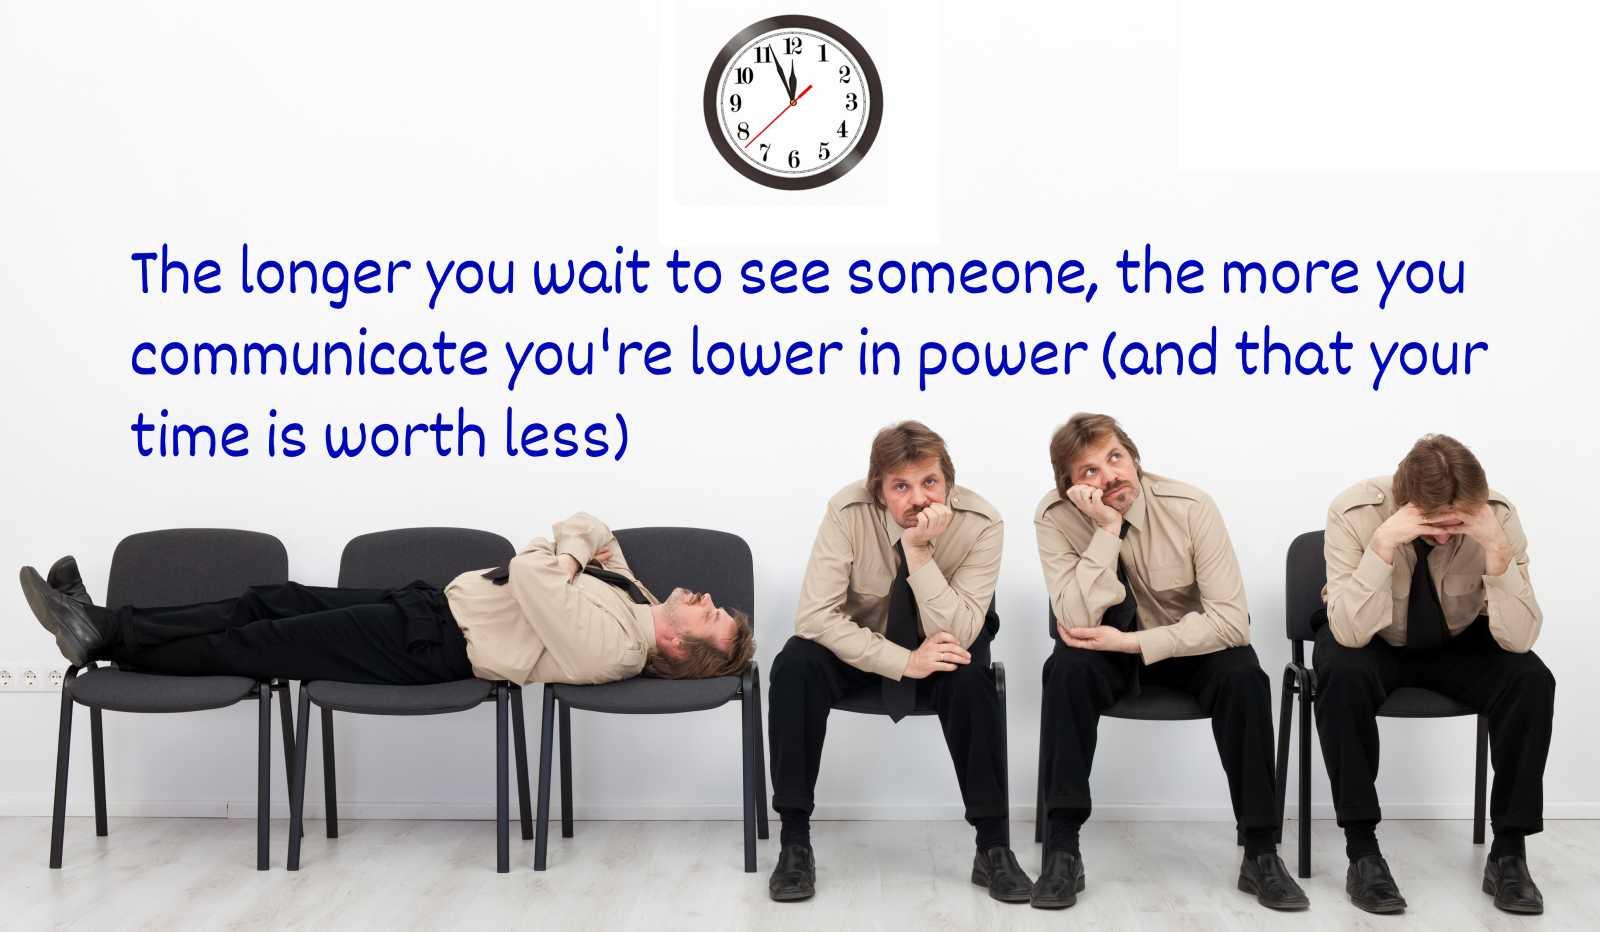 description of waiting power dynamics